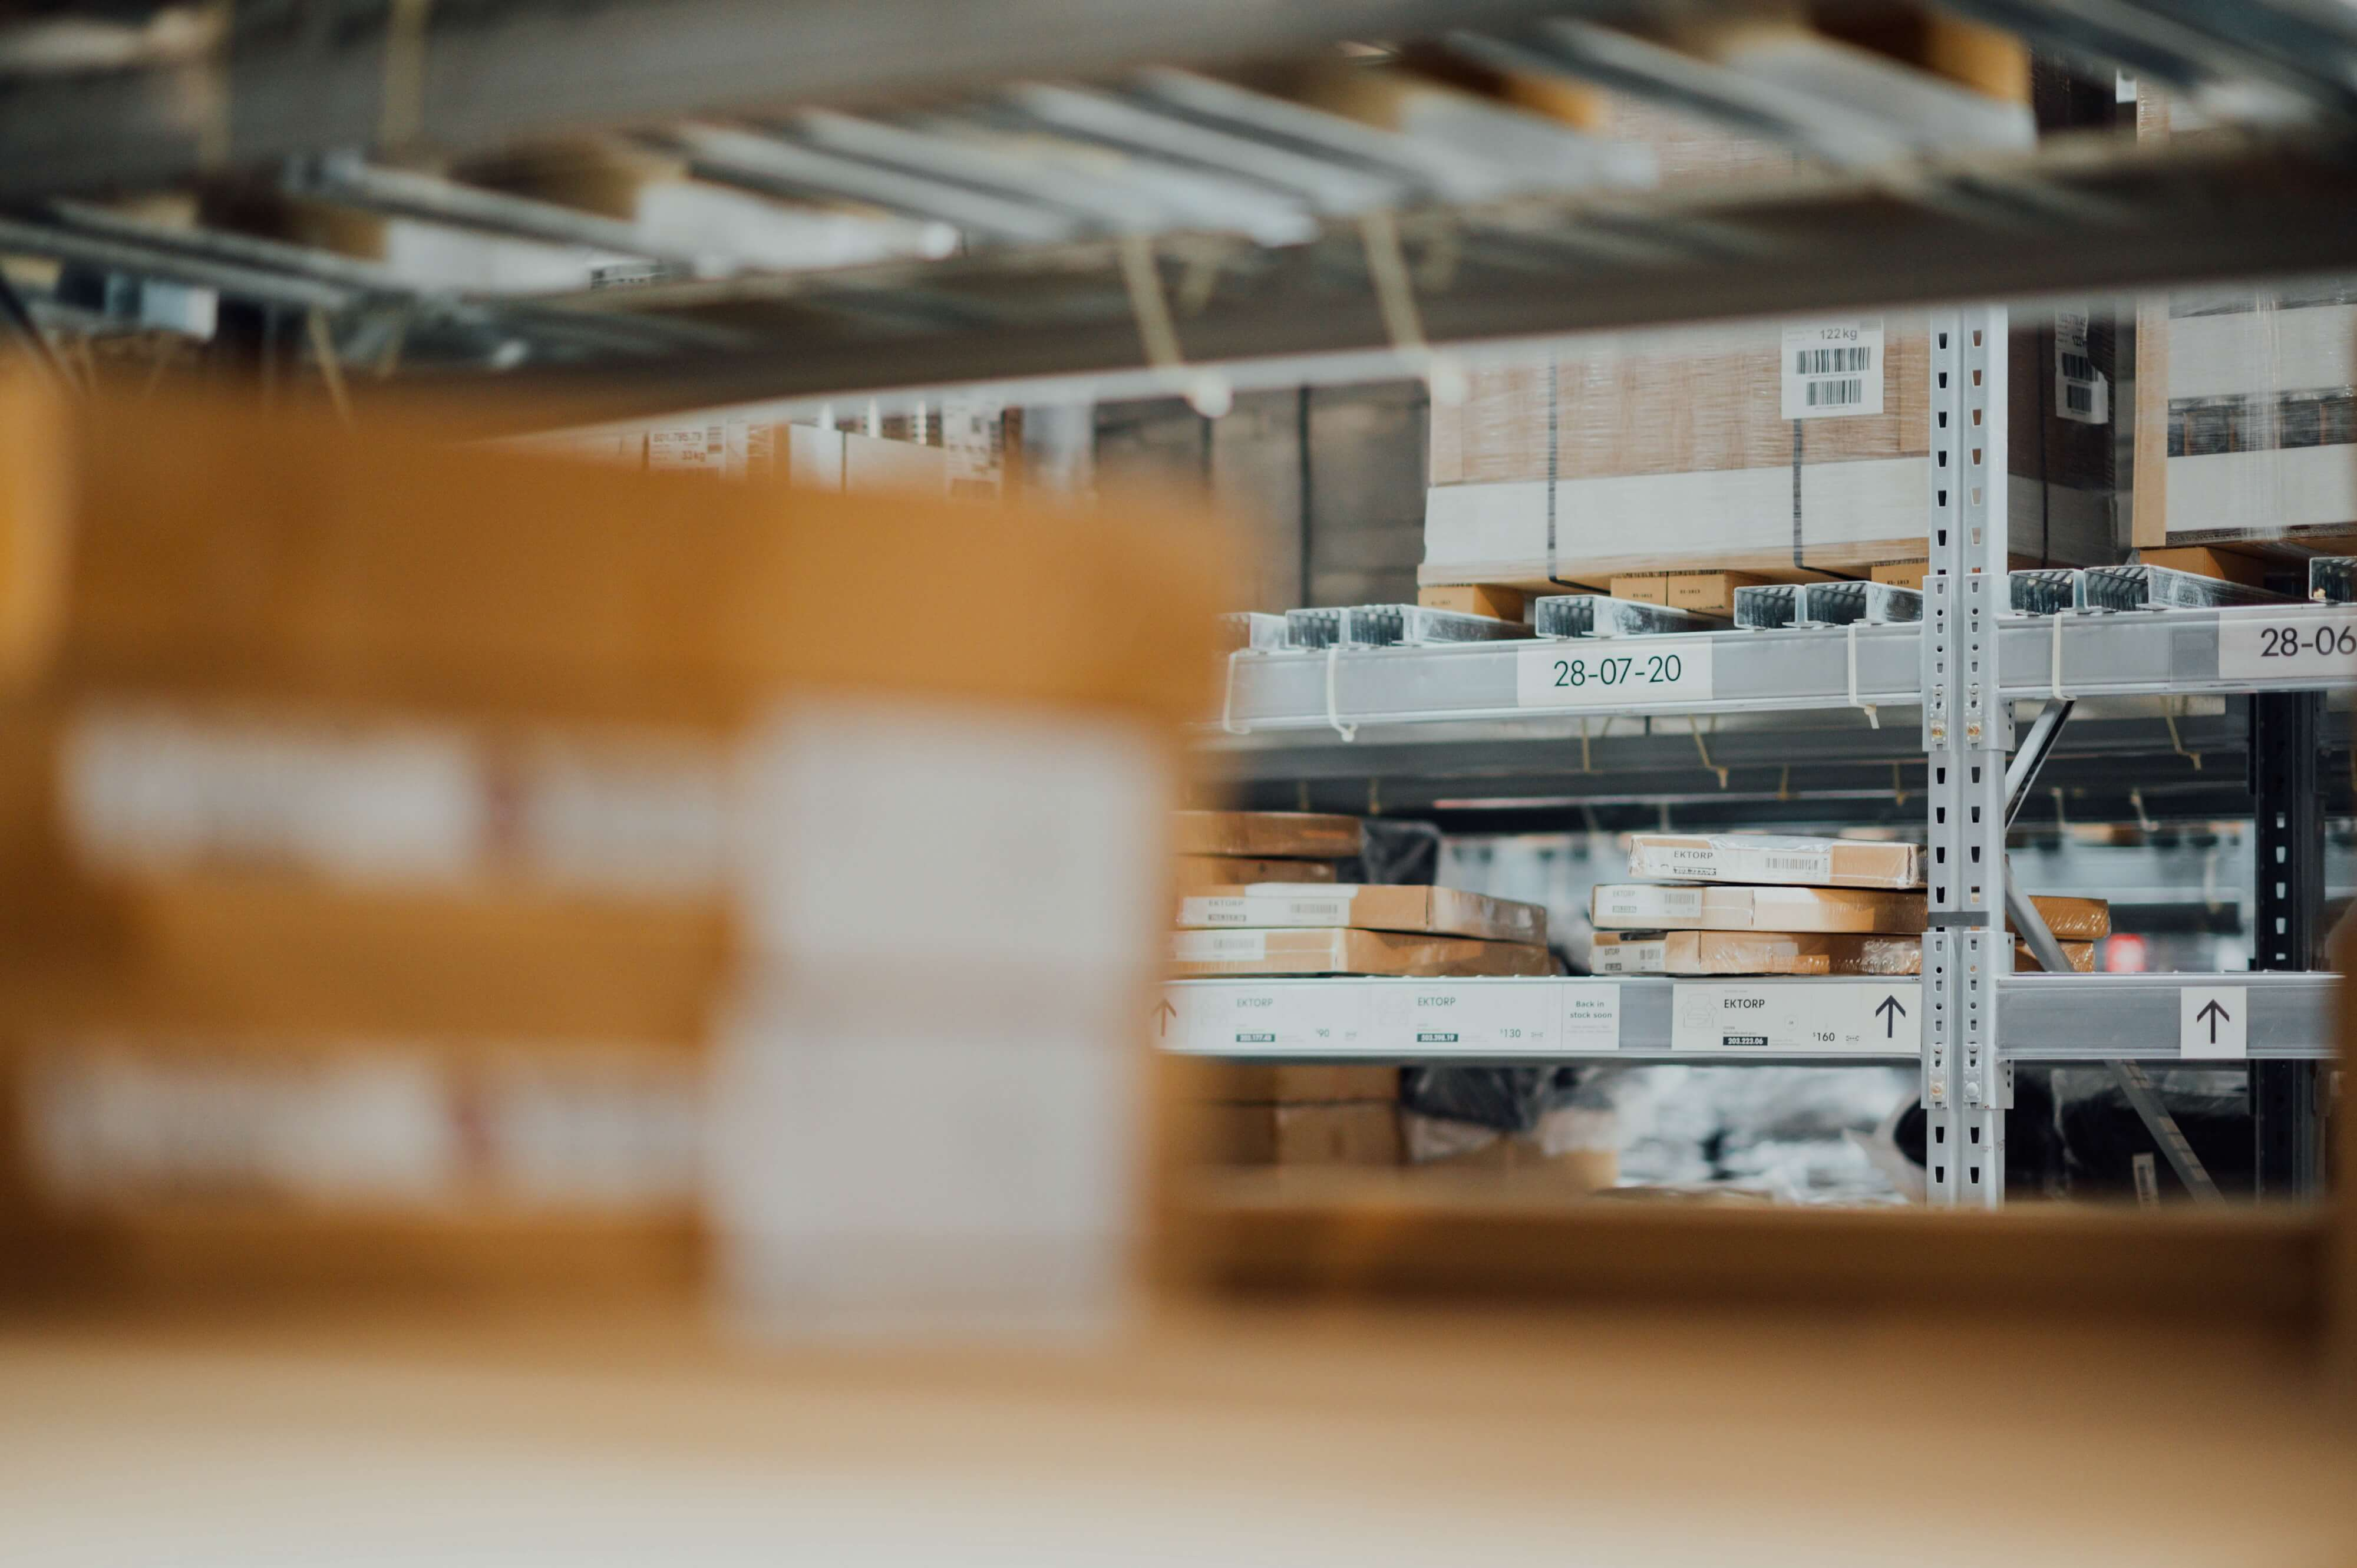 IoT warehouse